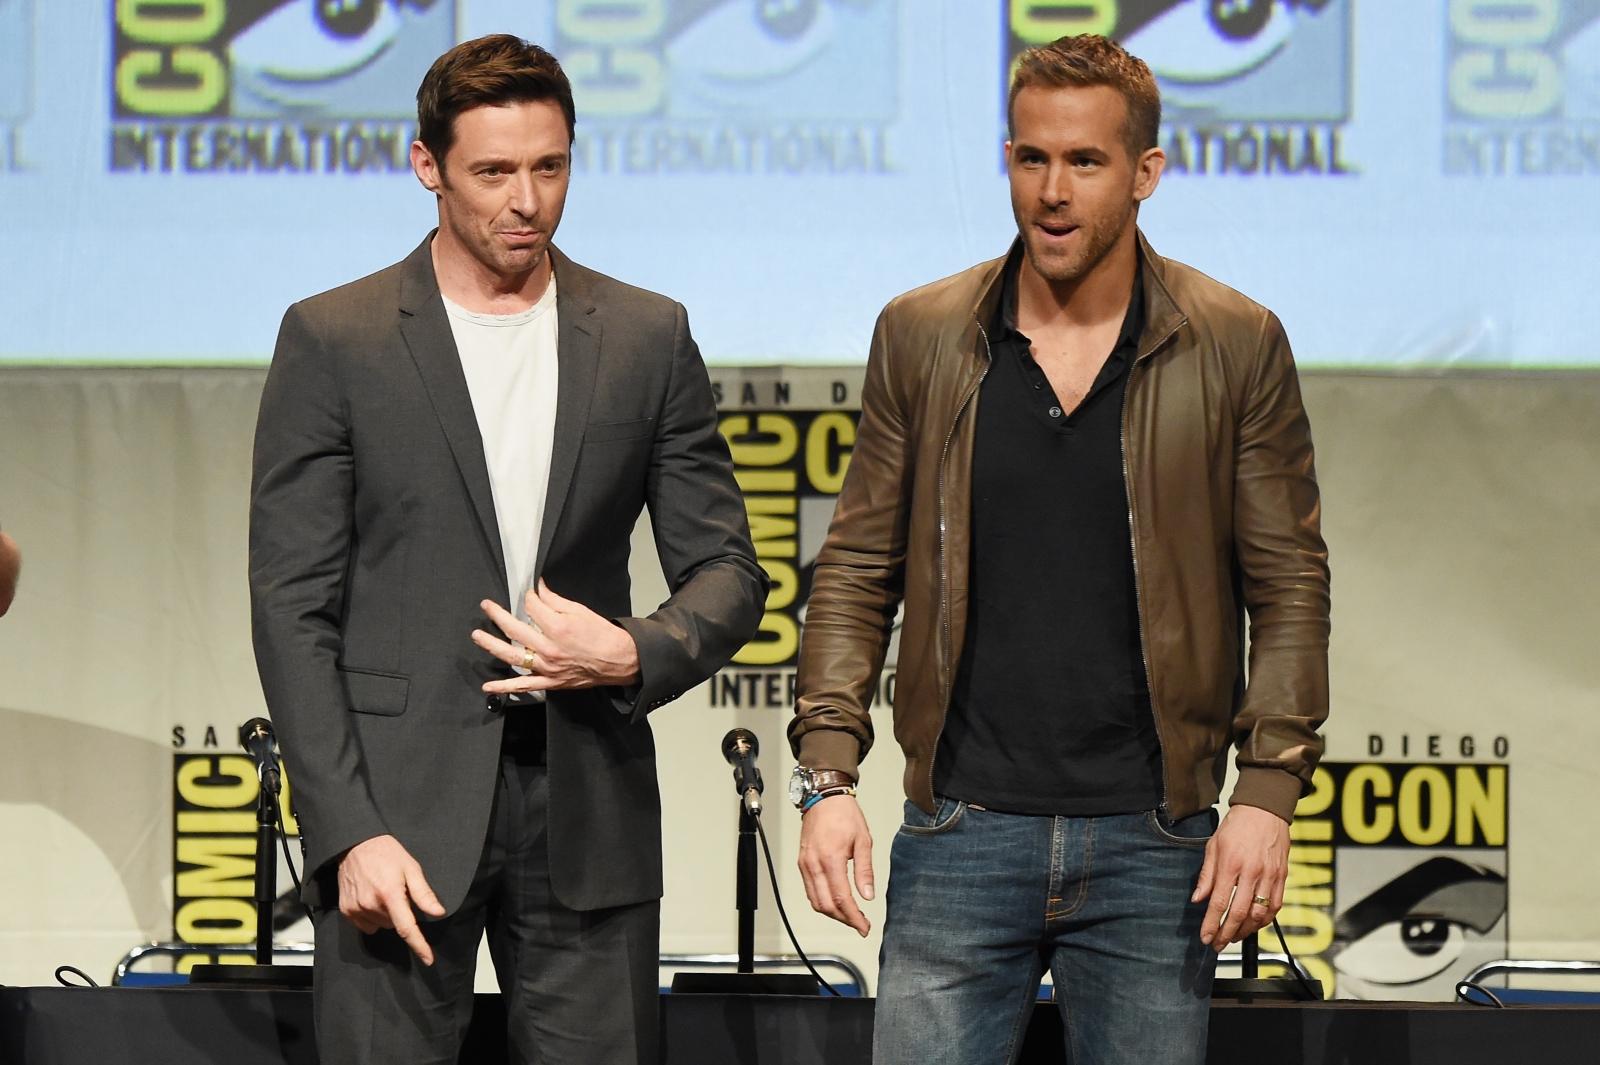 Hugh Jackman and Ryan Reynolds